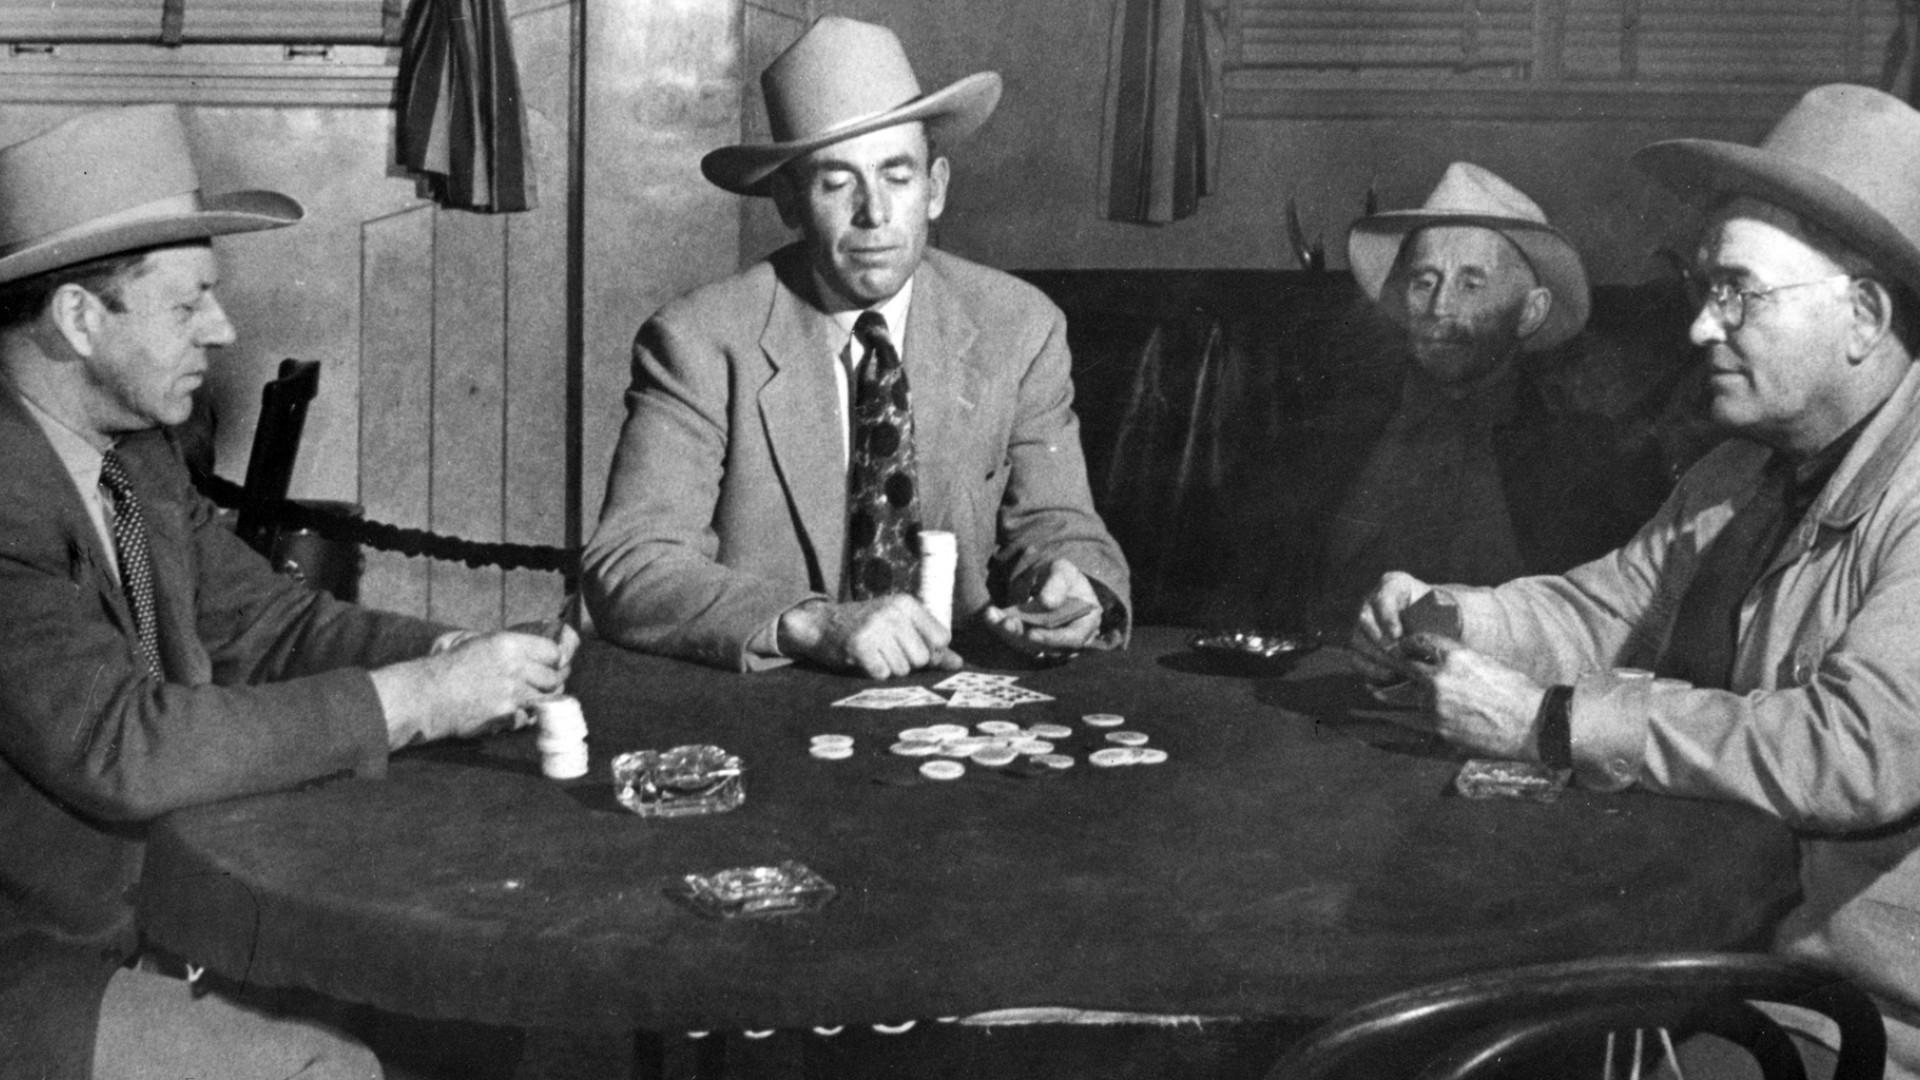 historiy-poker_table__hero